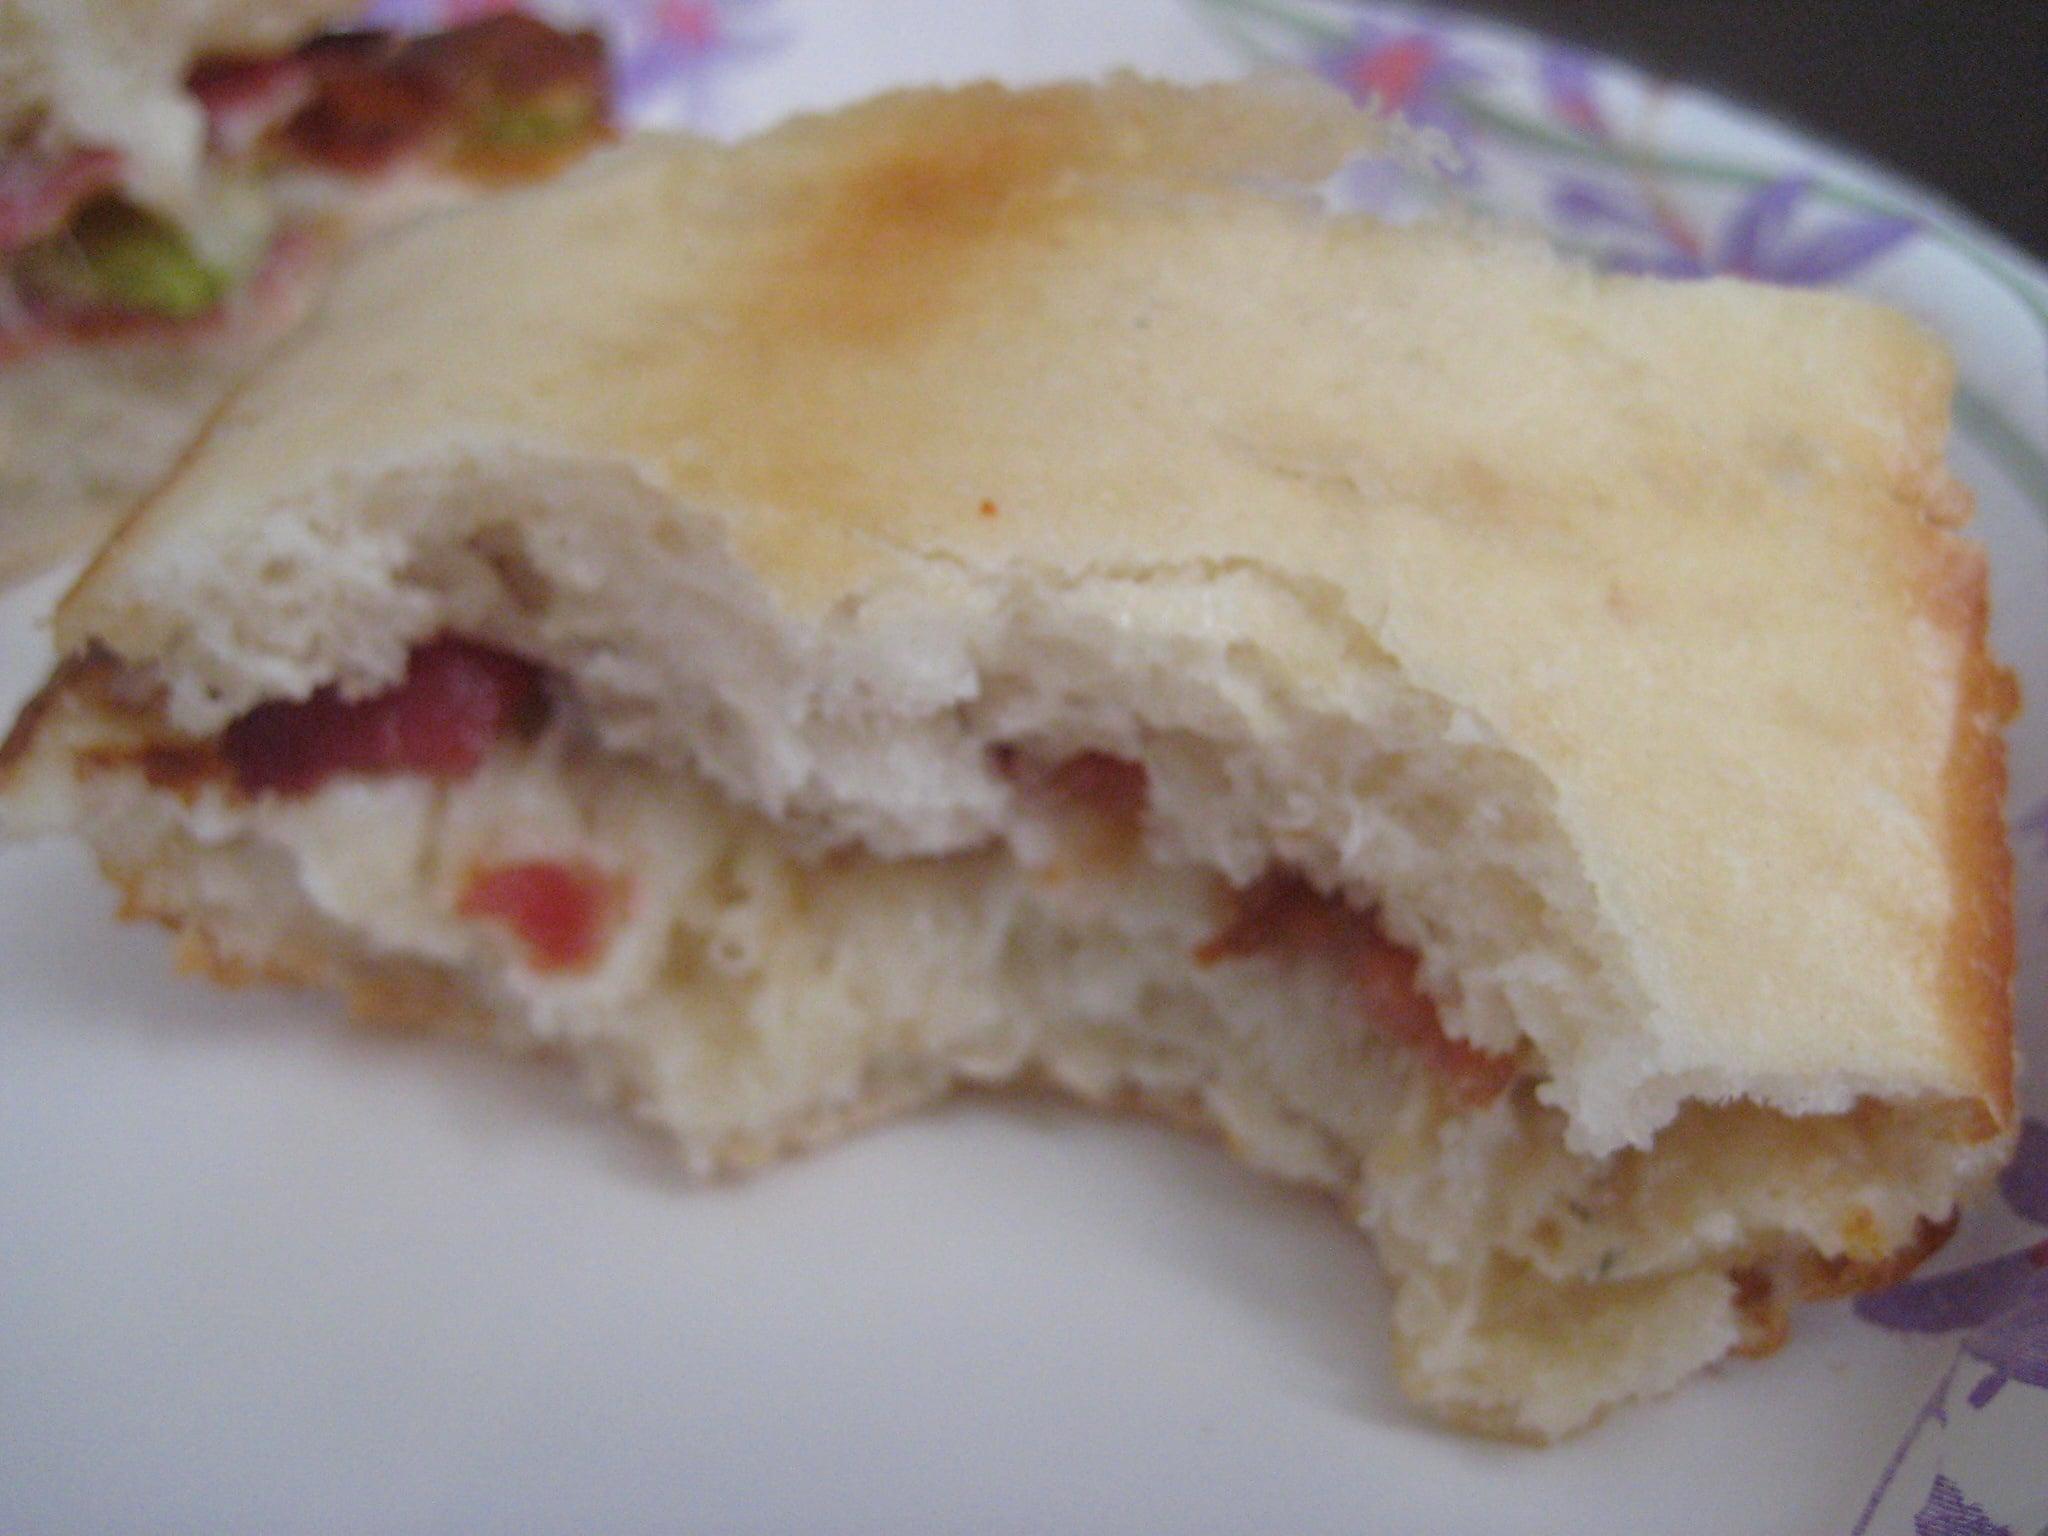 Domino's Baked Submarine Sandwiches